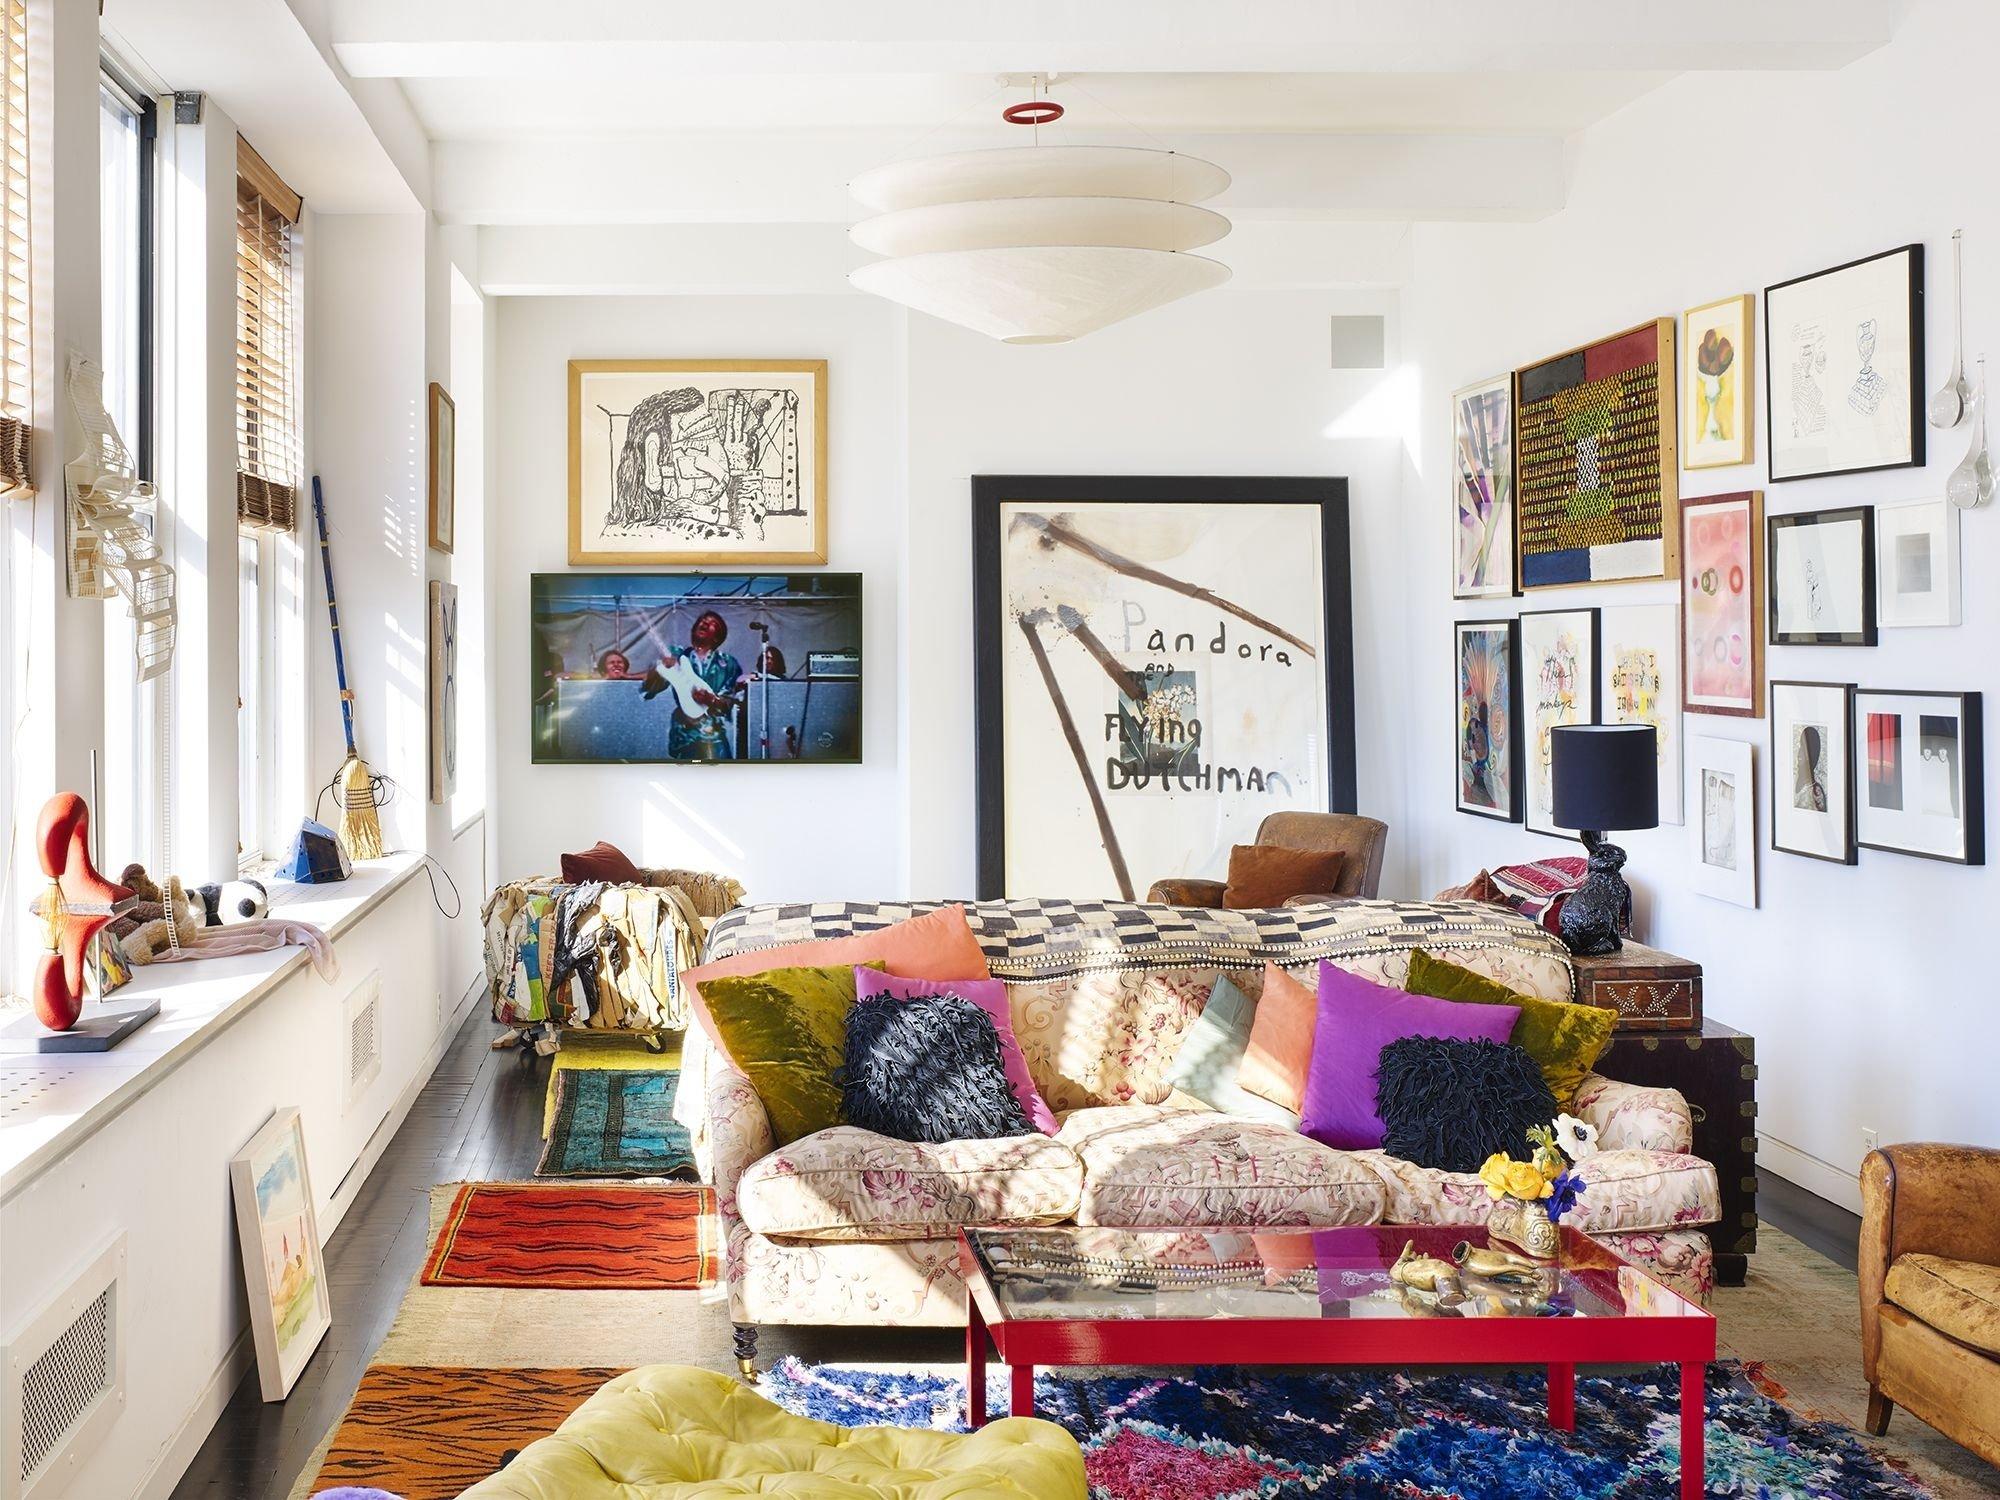 10 Pretty Decorating Ideas For Studio Apartments small space decorating ideas small apartments and room design tips 2 2020